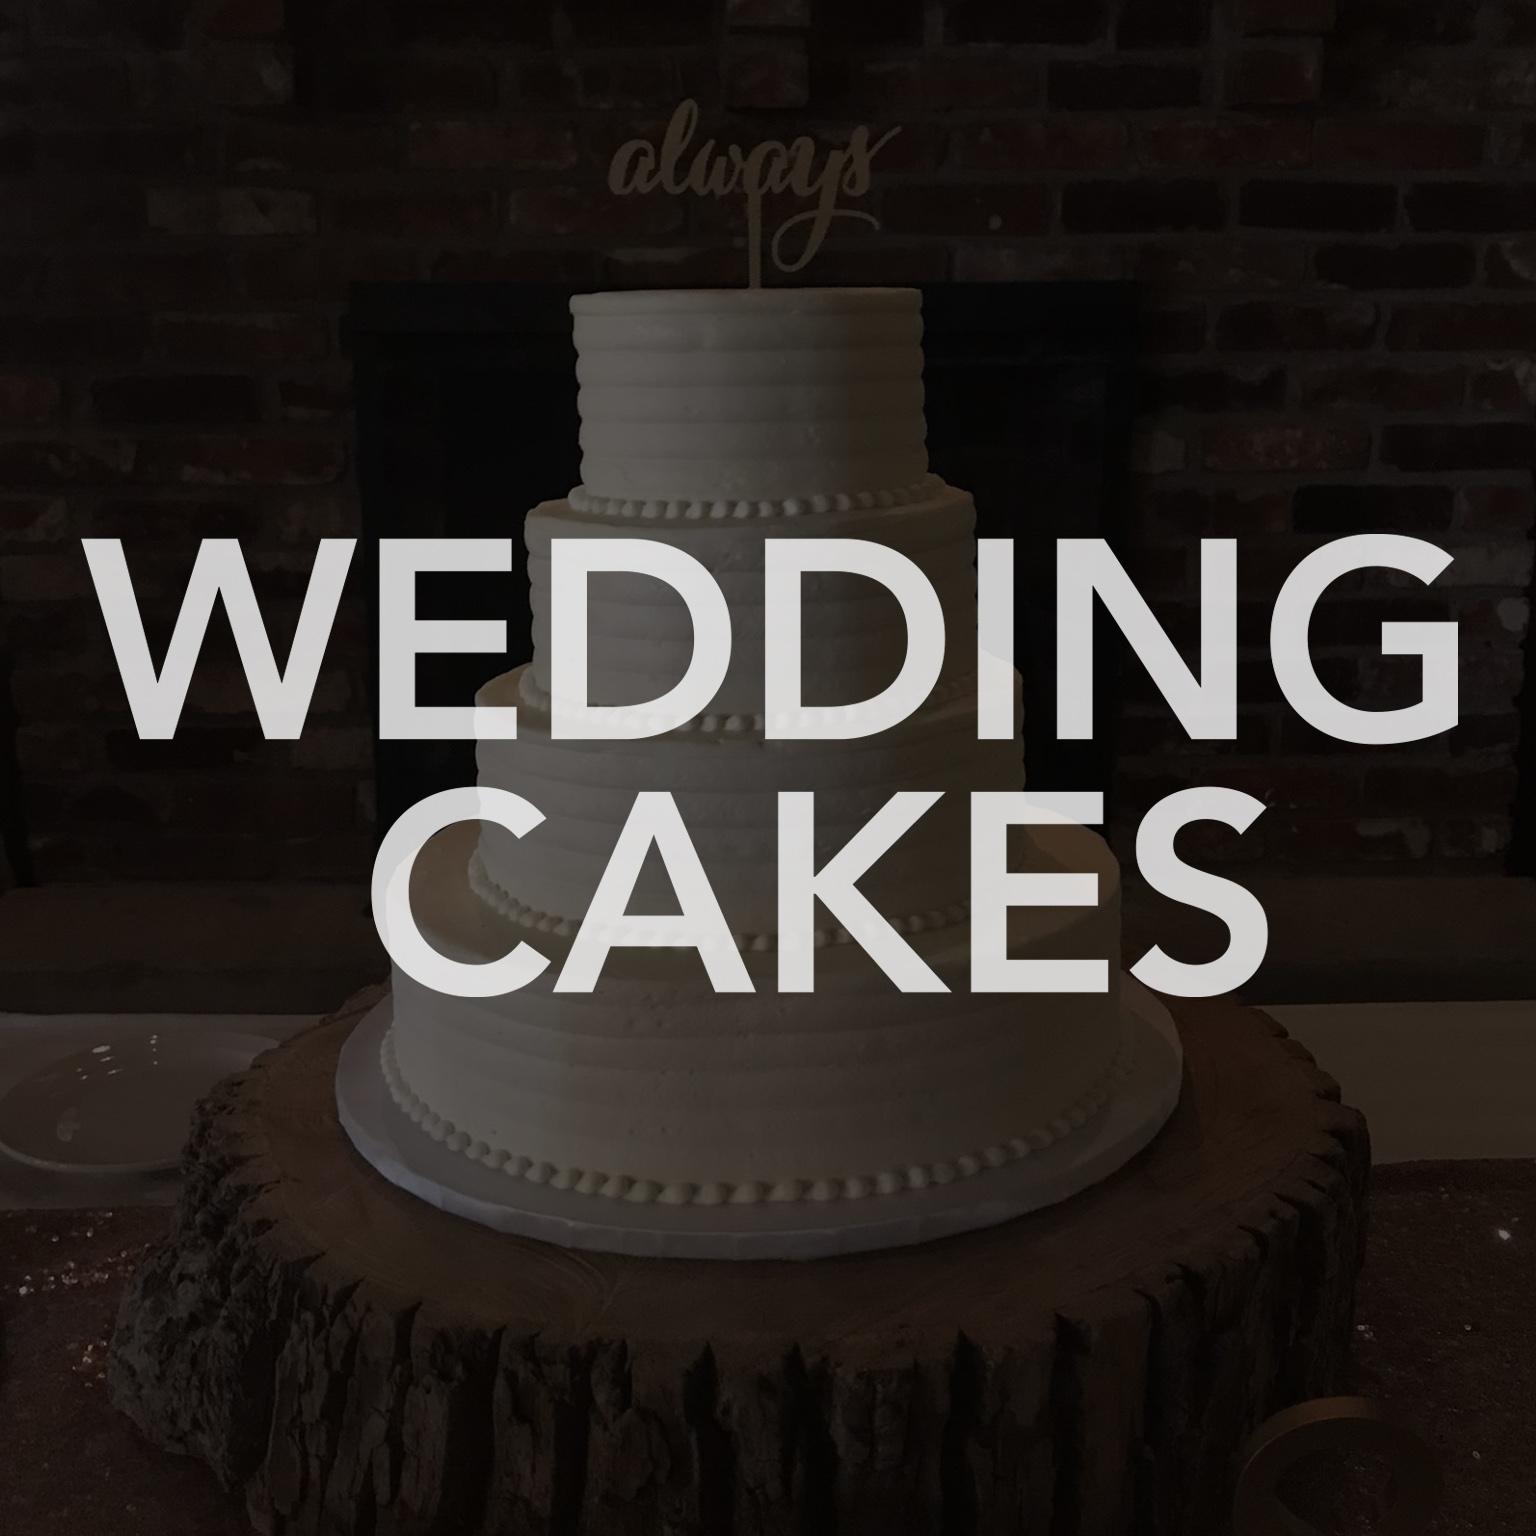 Wedding Cakes Image.jpg